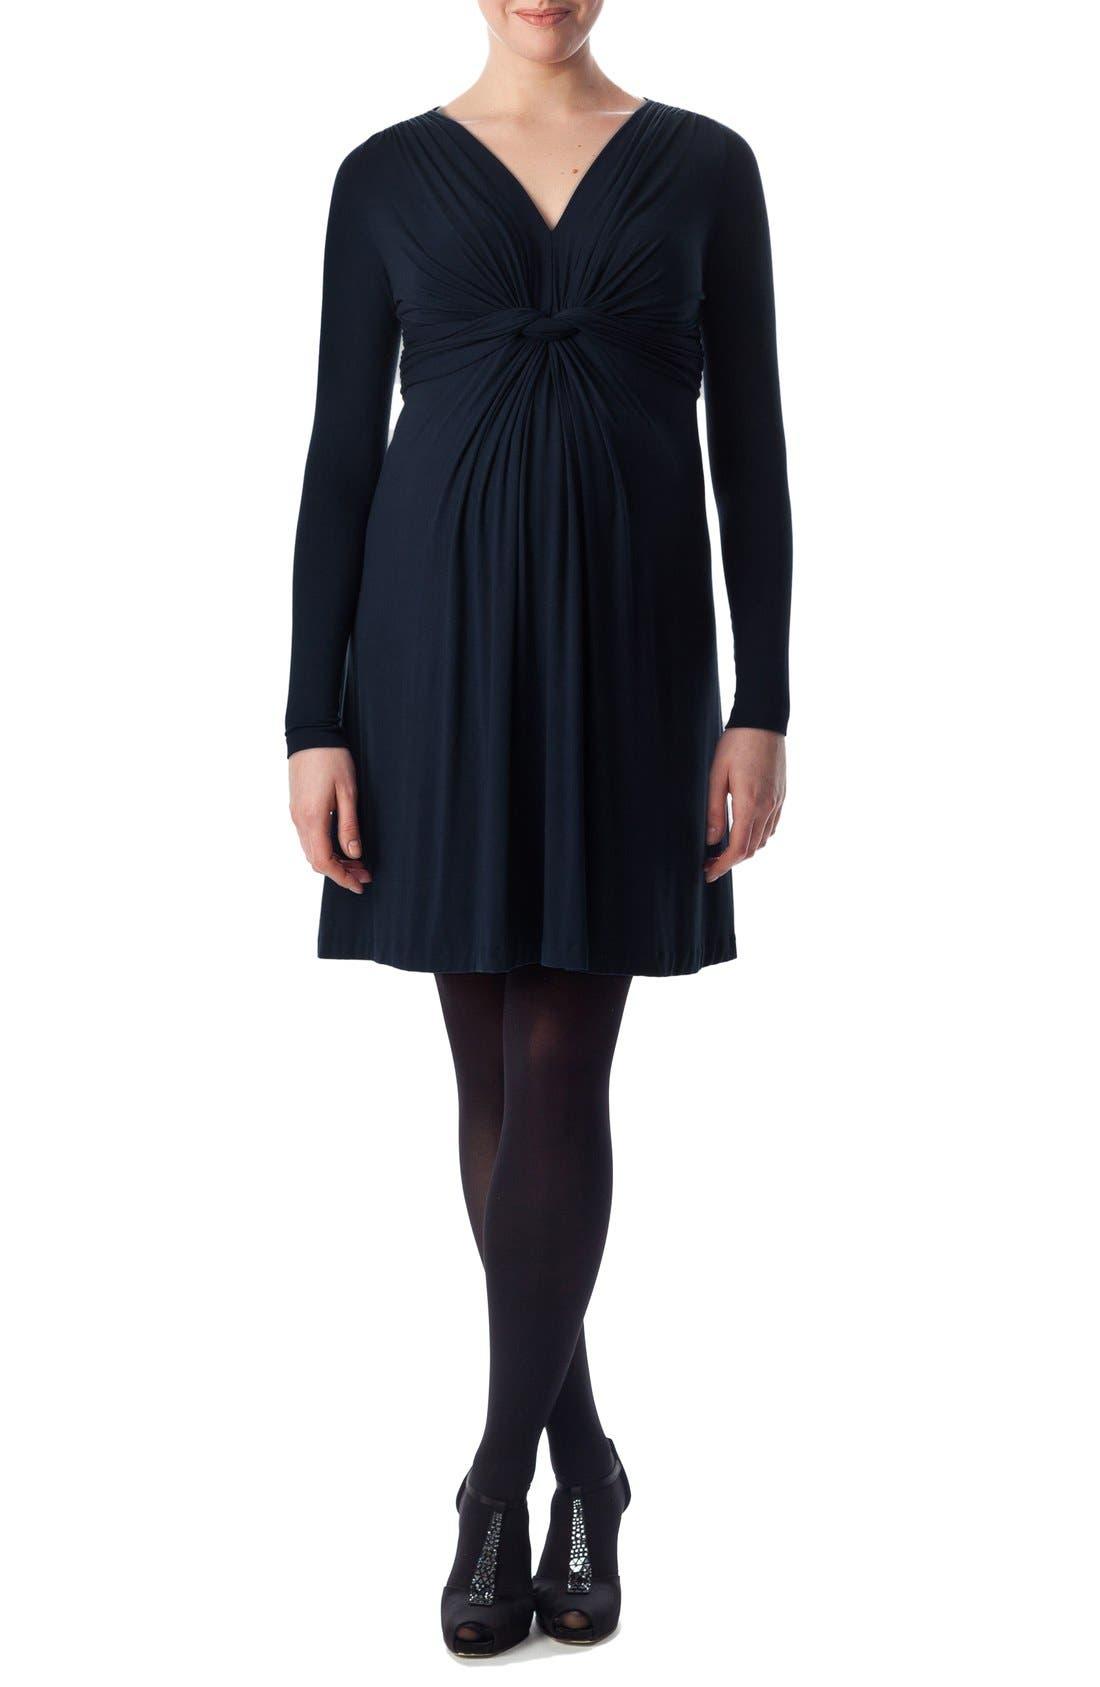 Main Image - PIETRO BRUNELLI 'Madonna' Twist Detail Jersey Maternity Dress